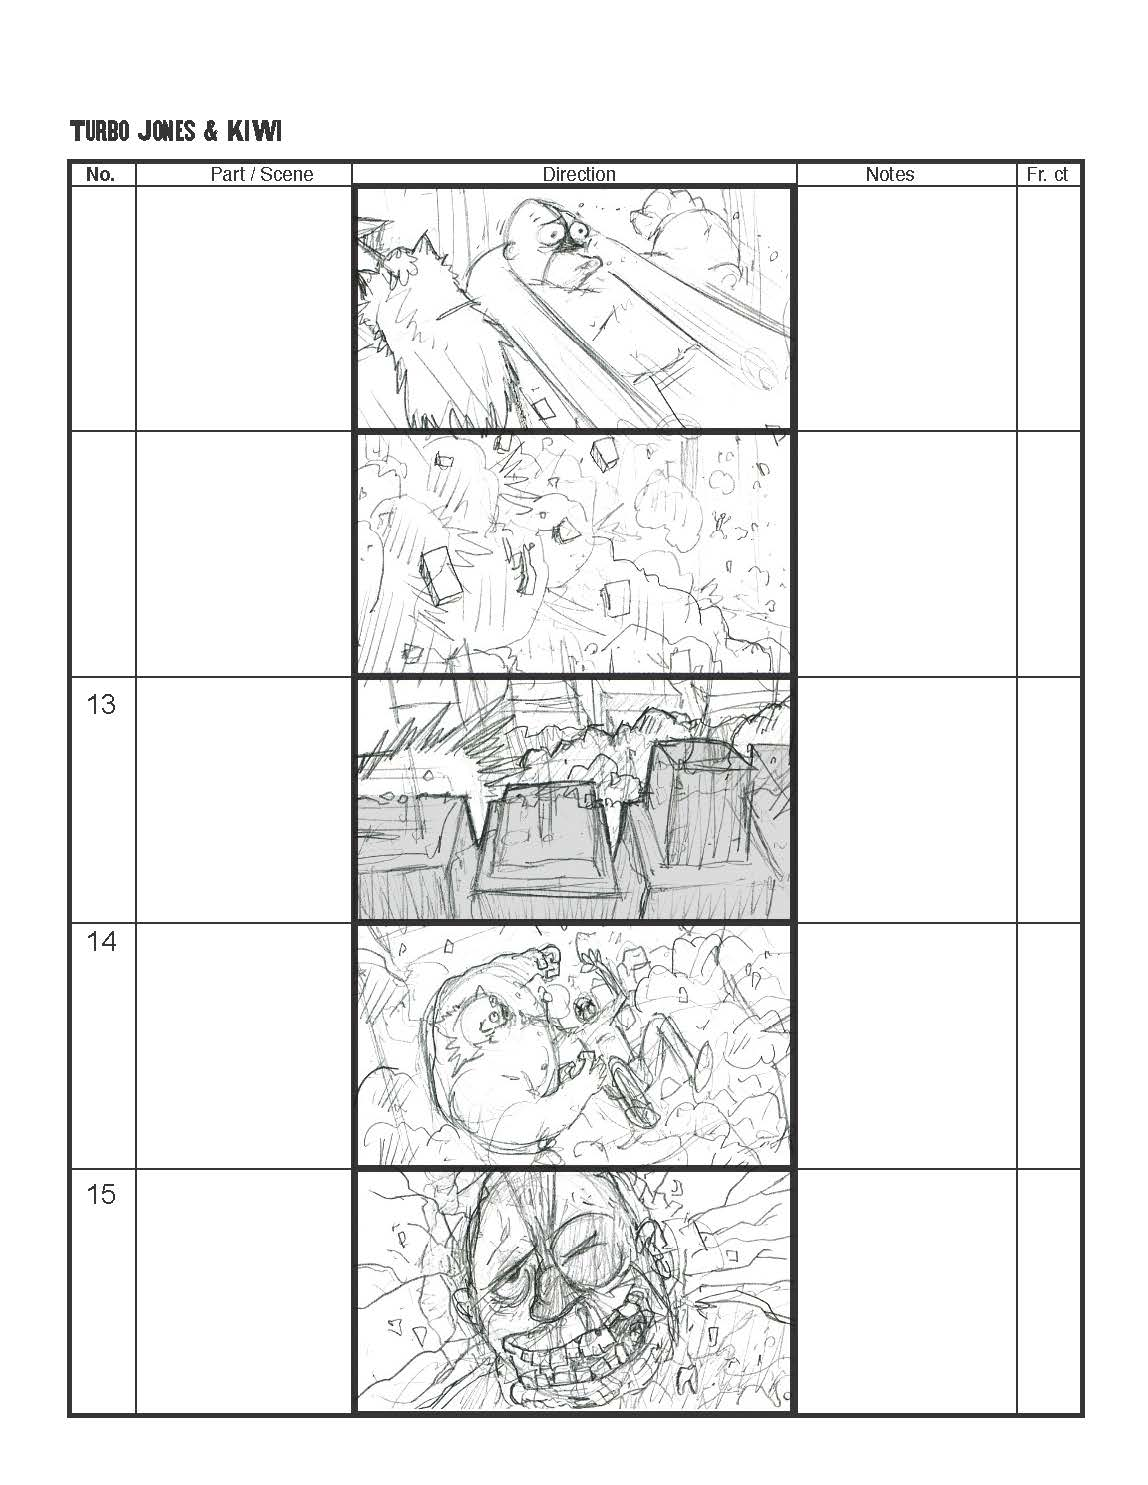 TJK_Storyboards_v01_HIGH_Page_06.jpg